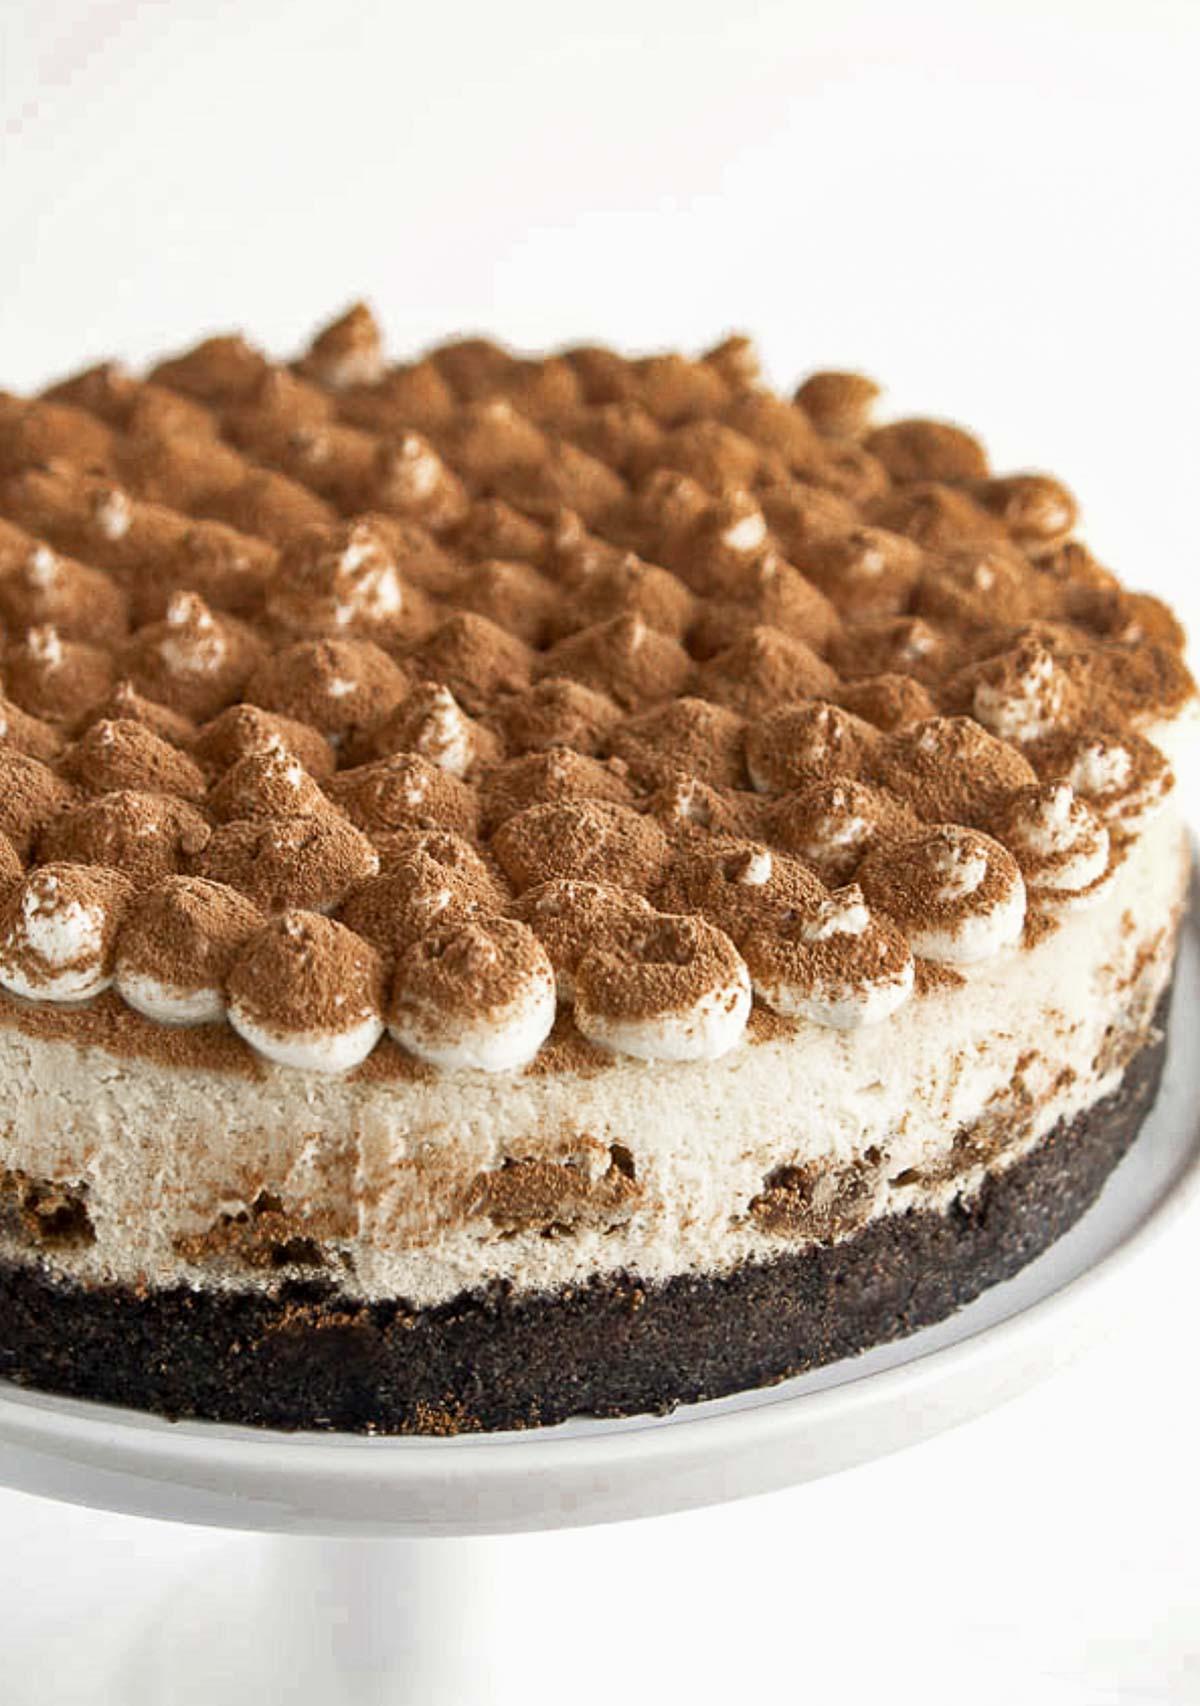 A tiramisu cheesecake on a cakestand.